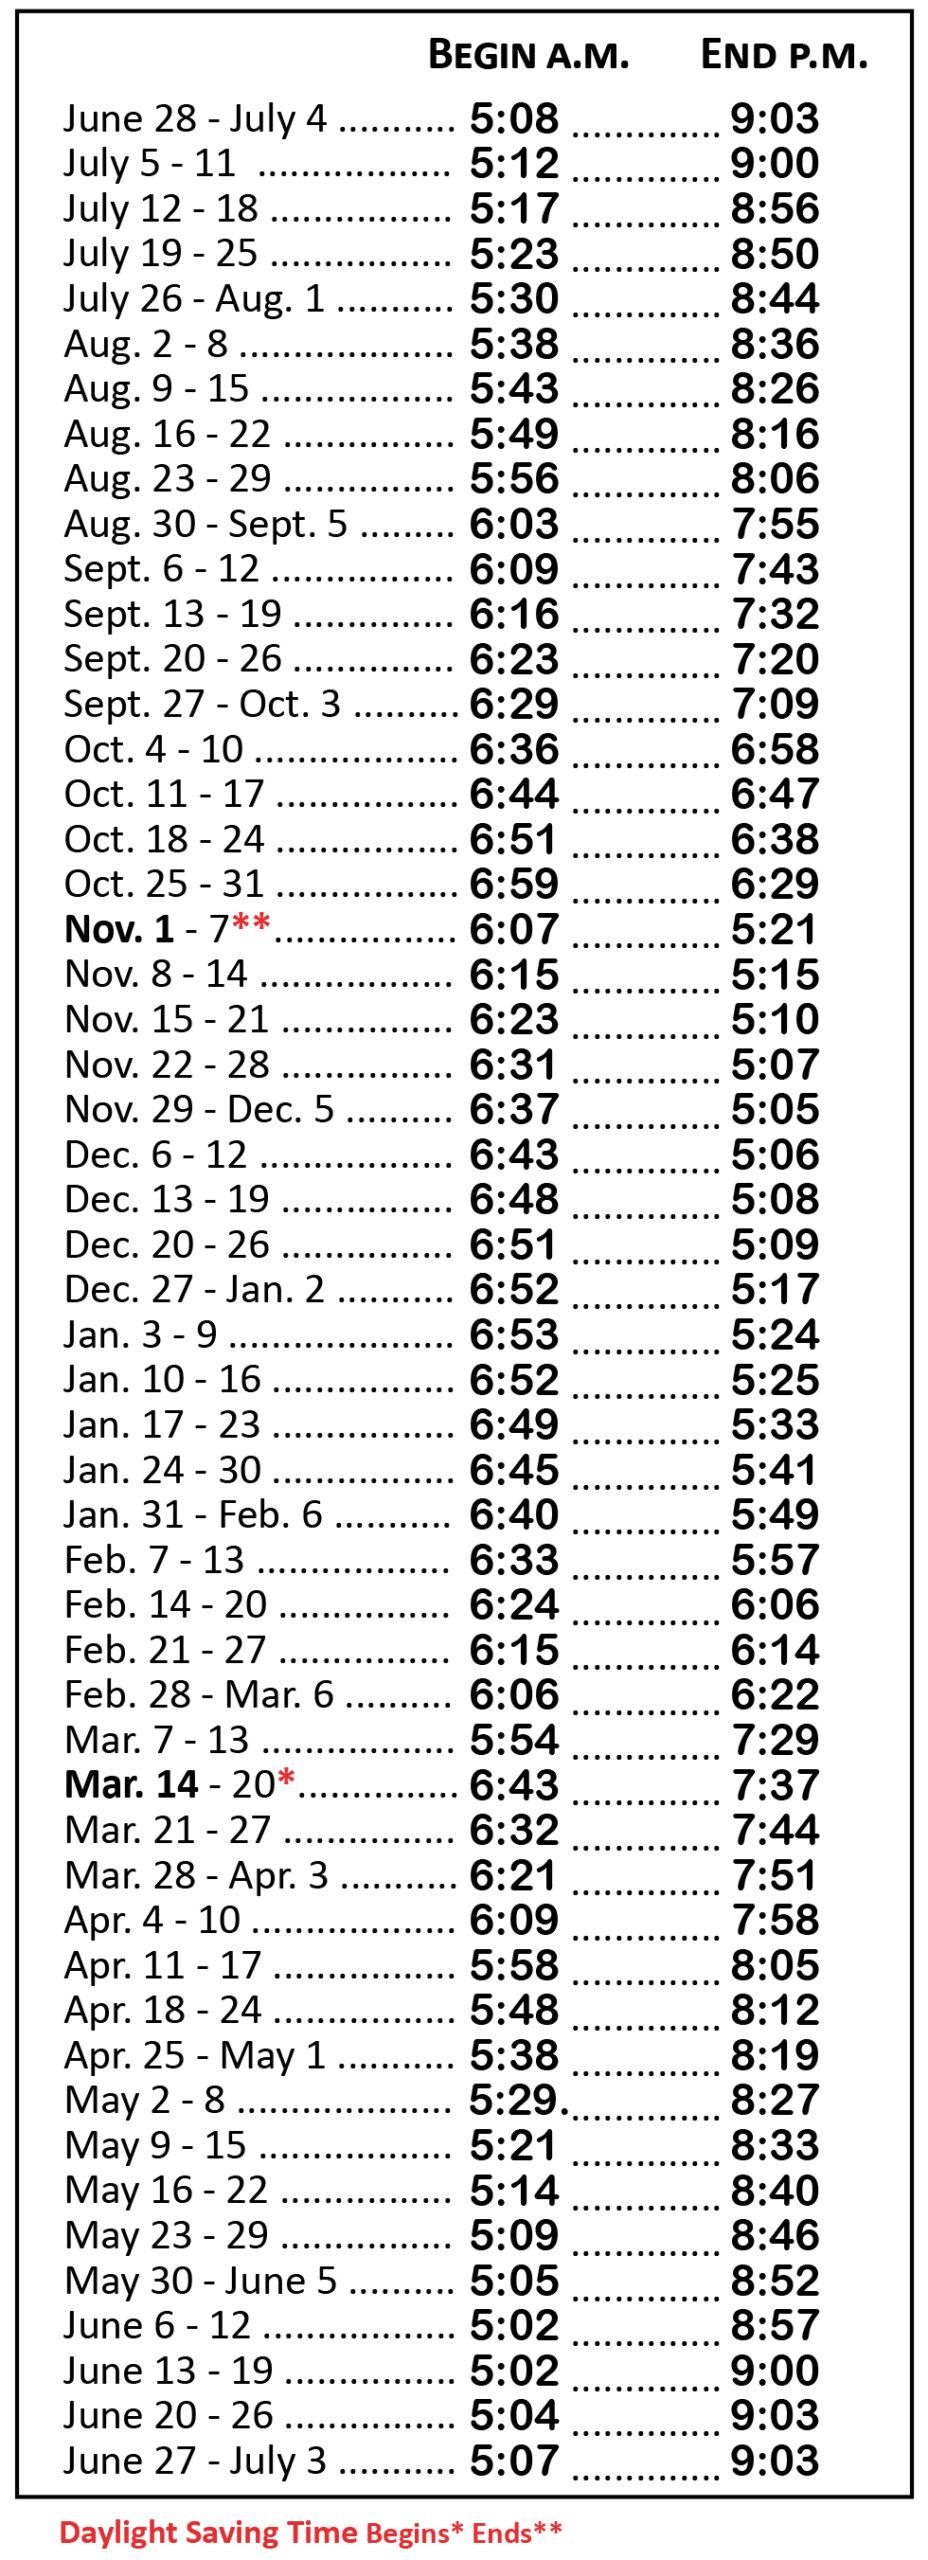 2020-21 Hunting Hours Table throughout Deer Hunting Calendar 2021